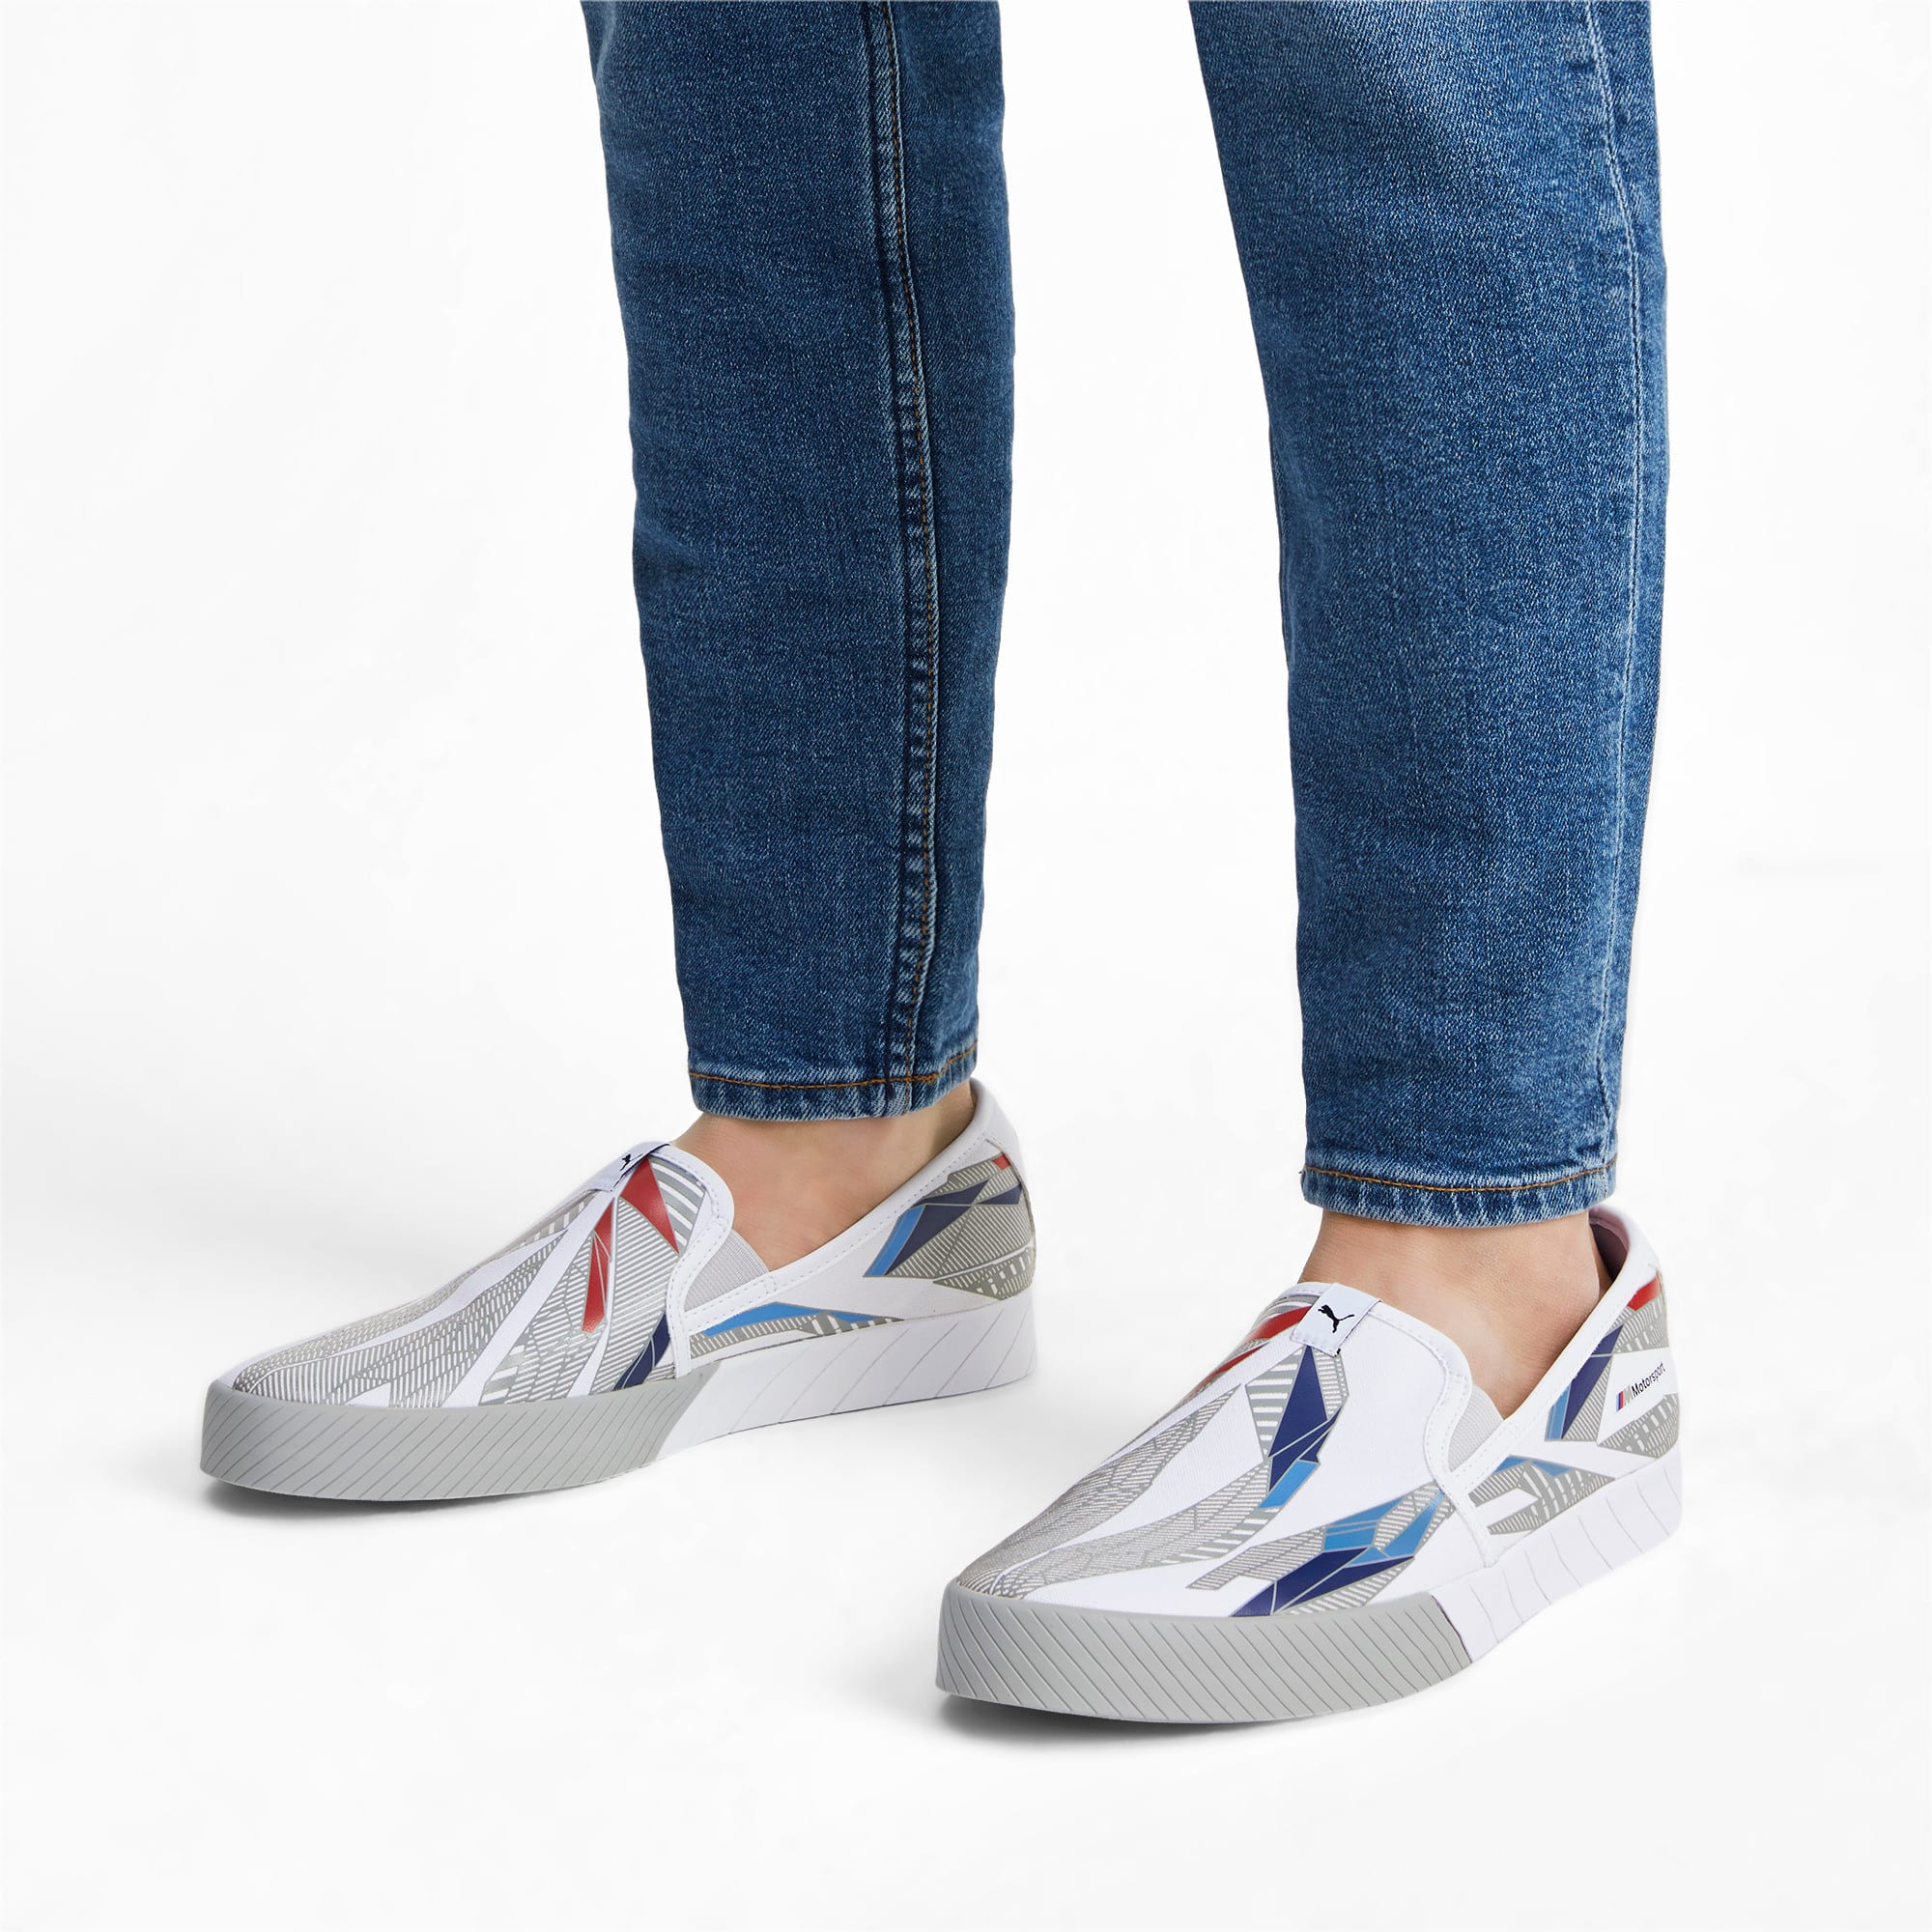 Thumbnail 2 of BMW M Motorsport Slip-On Gradient Track Shoes, Puma White-Gray Violet, medium